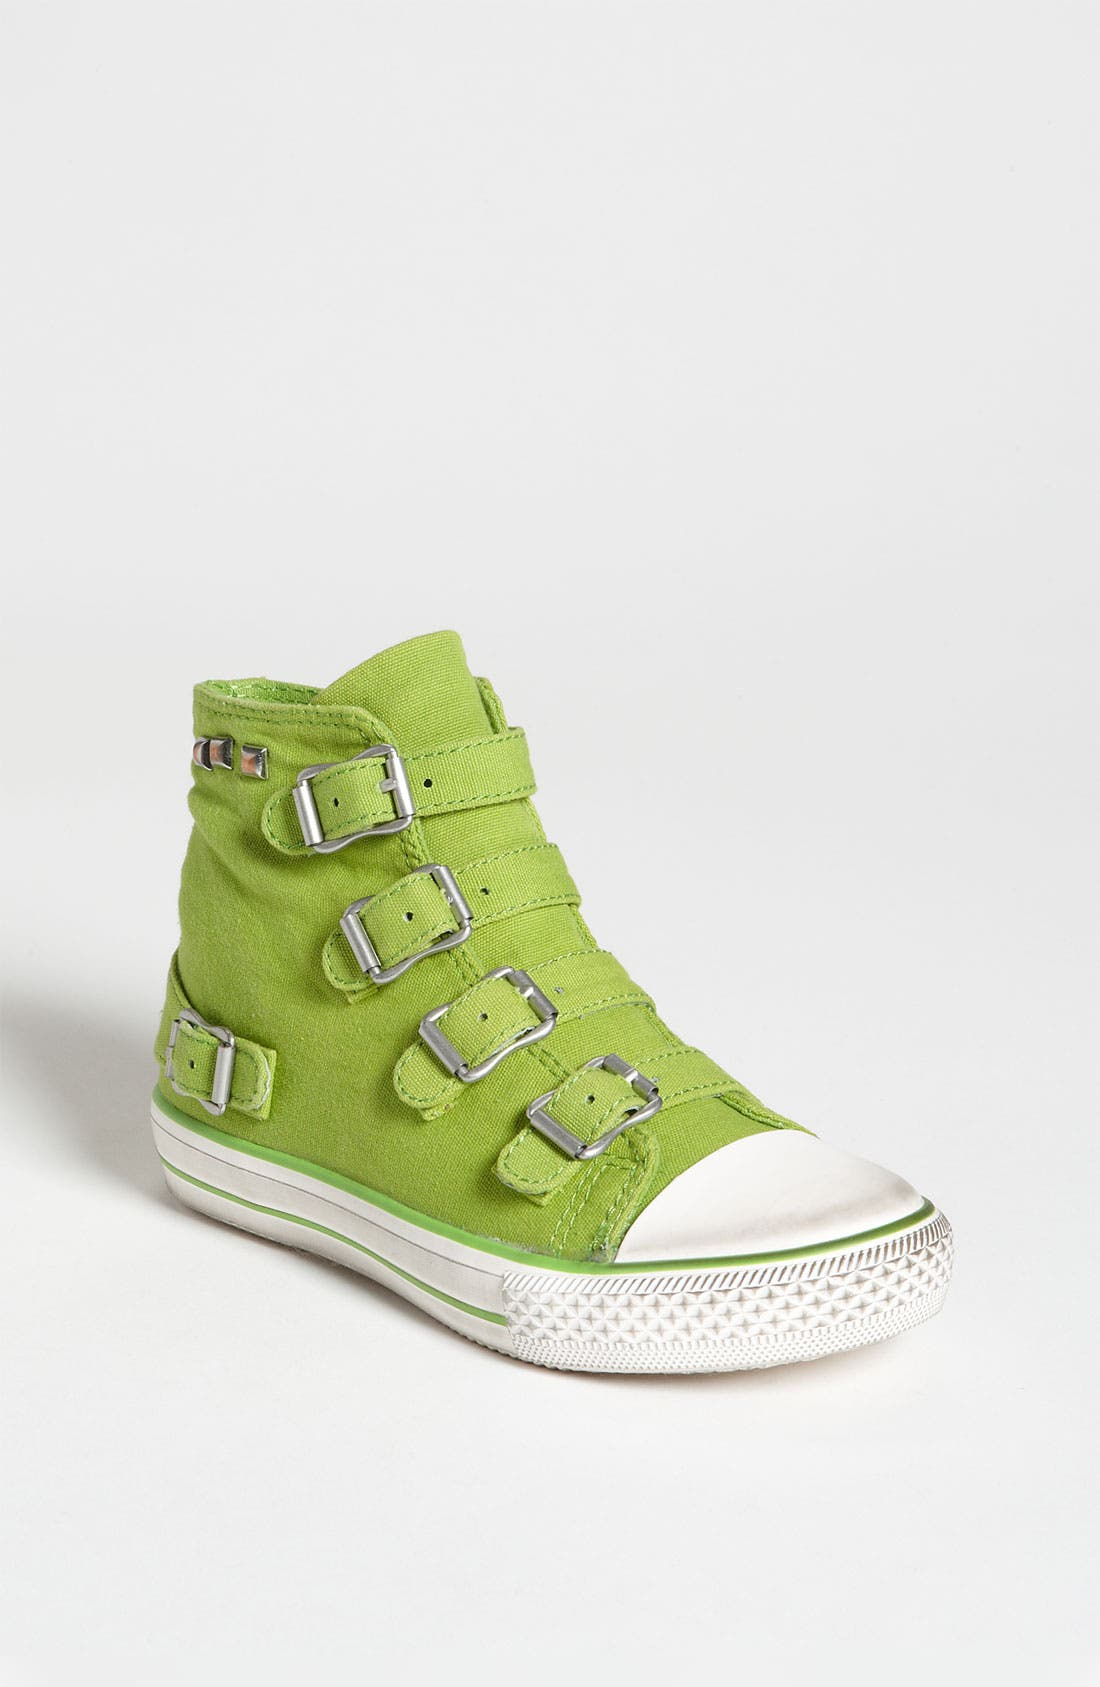 Alternate Image 1 Selected - Ash 'Flip' High Top Sneaker (Toddler, Little Kid & Big Kid)